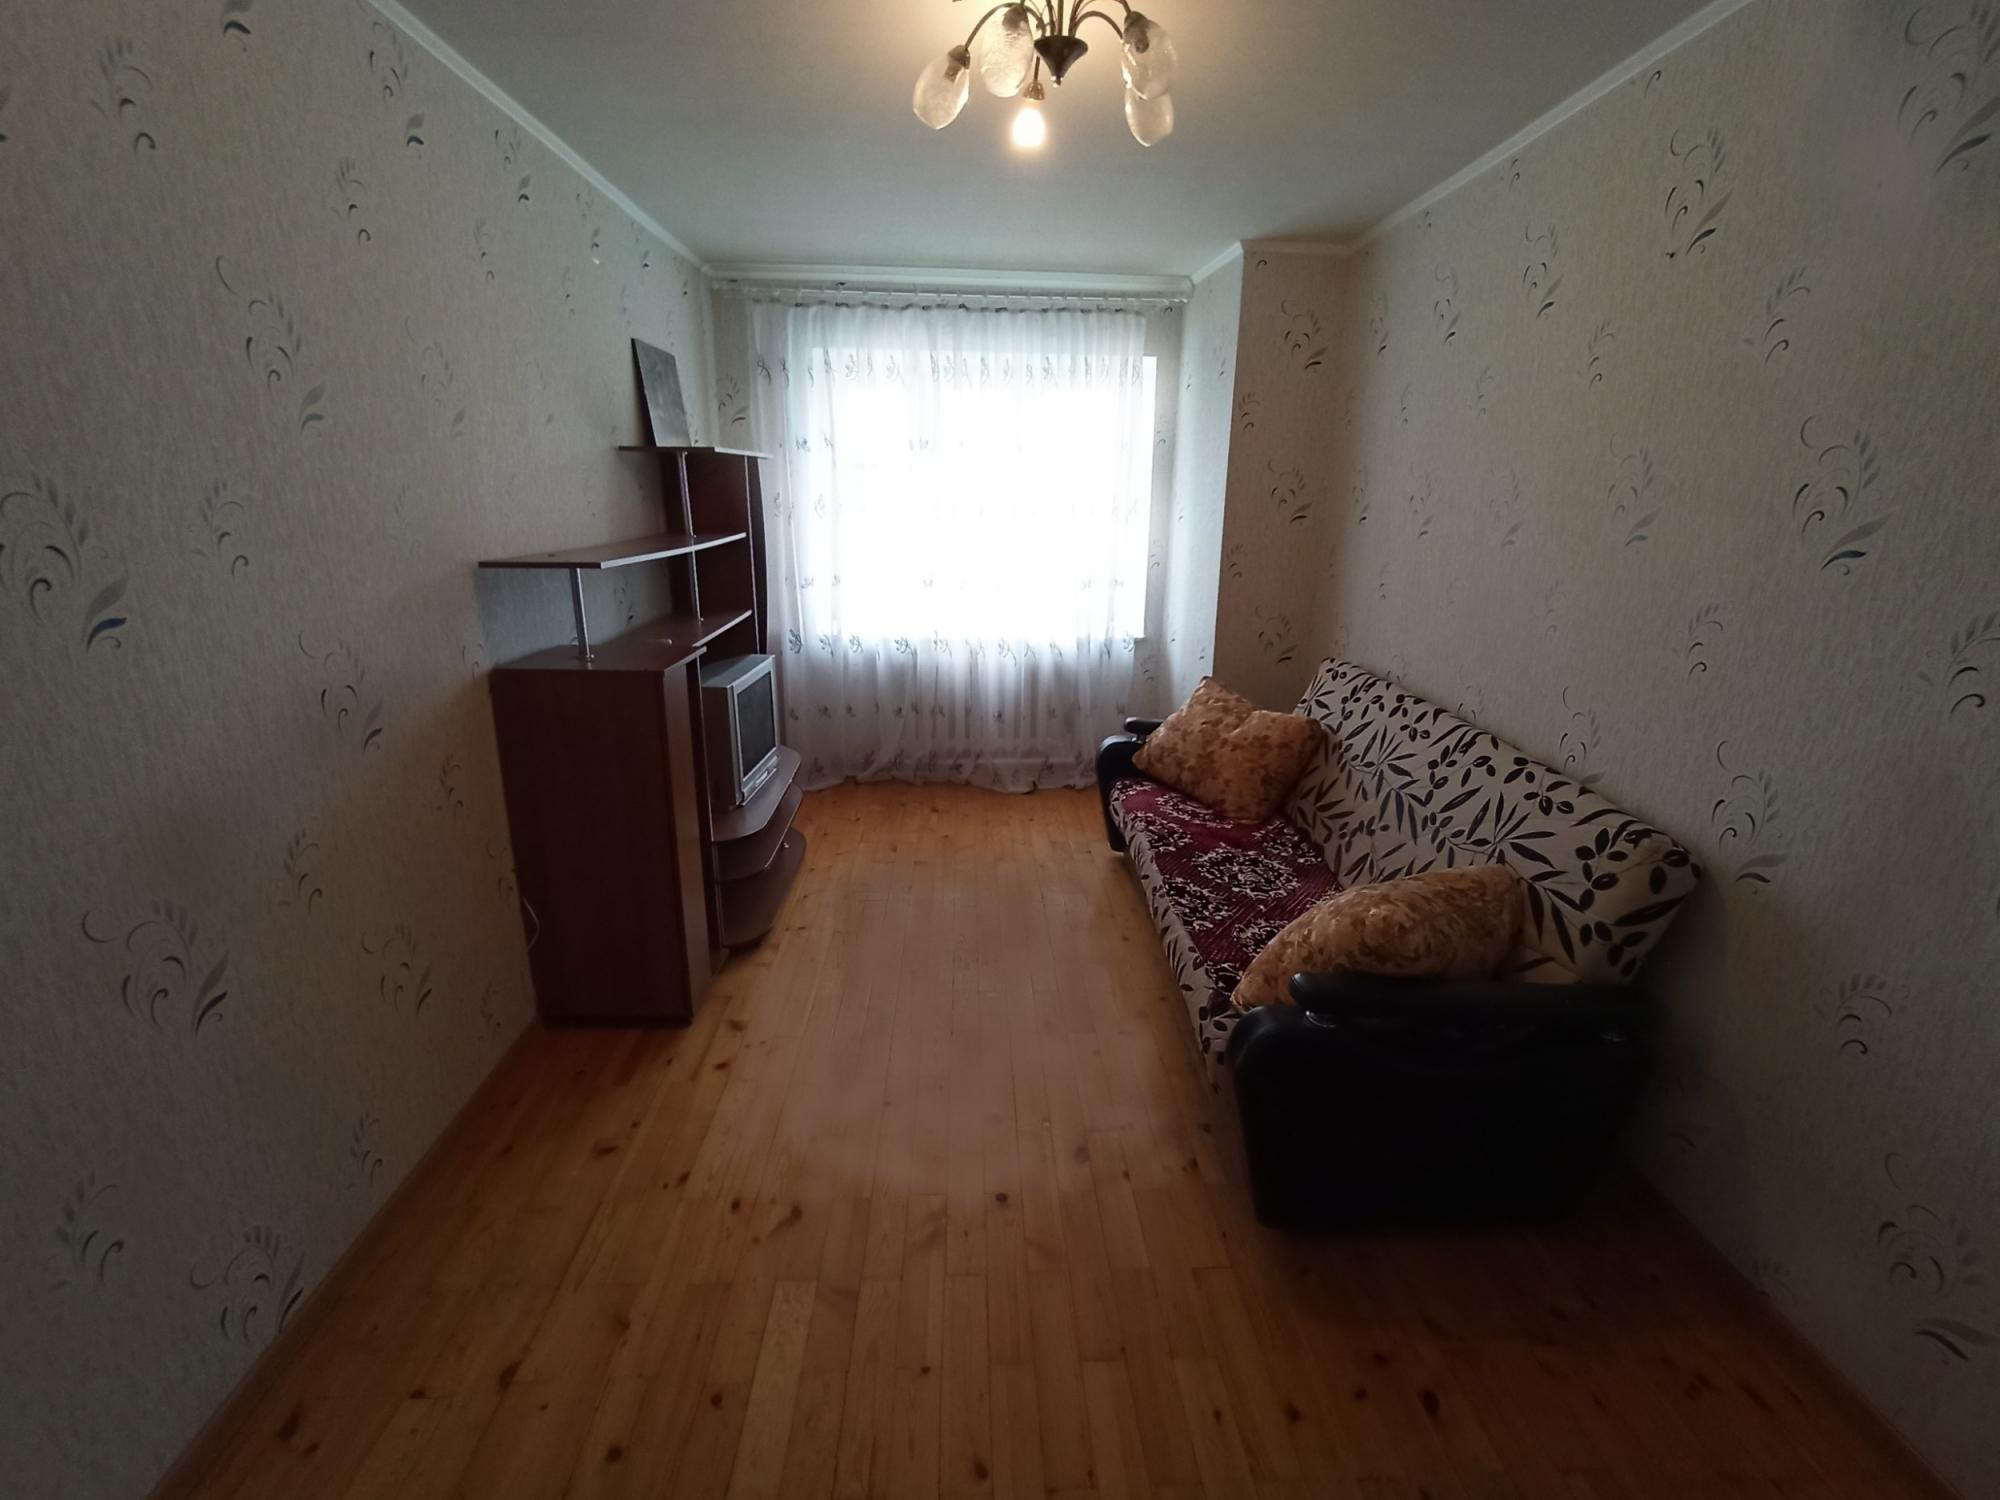 1к квартира улица Партизана Железняка, 2Г | 10000 | аренда в Красноярске фото 0